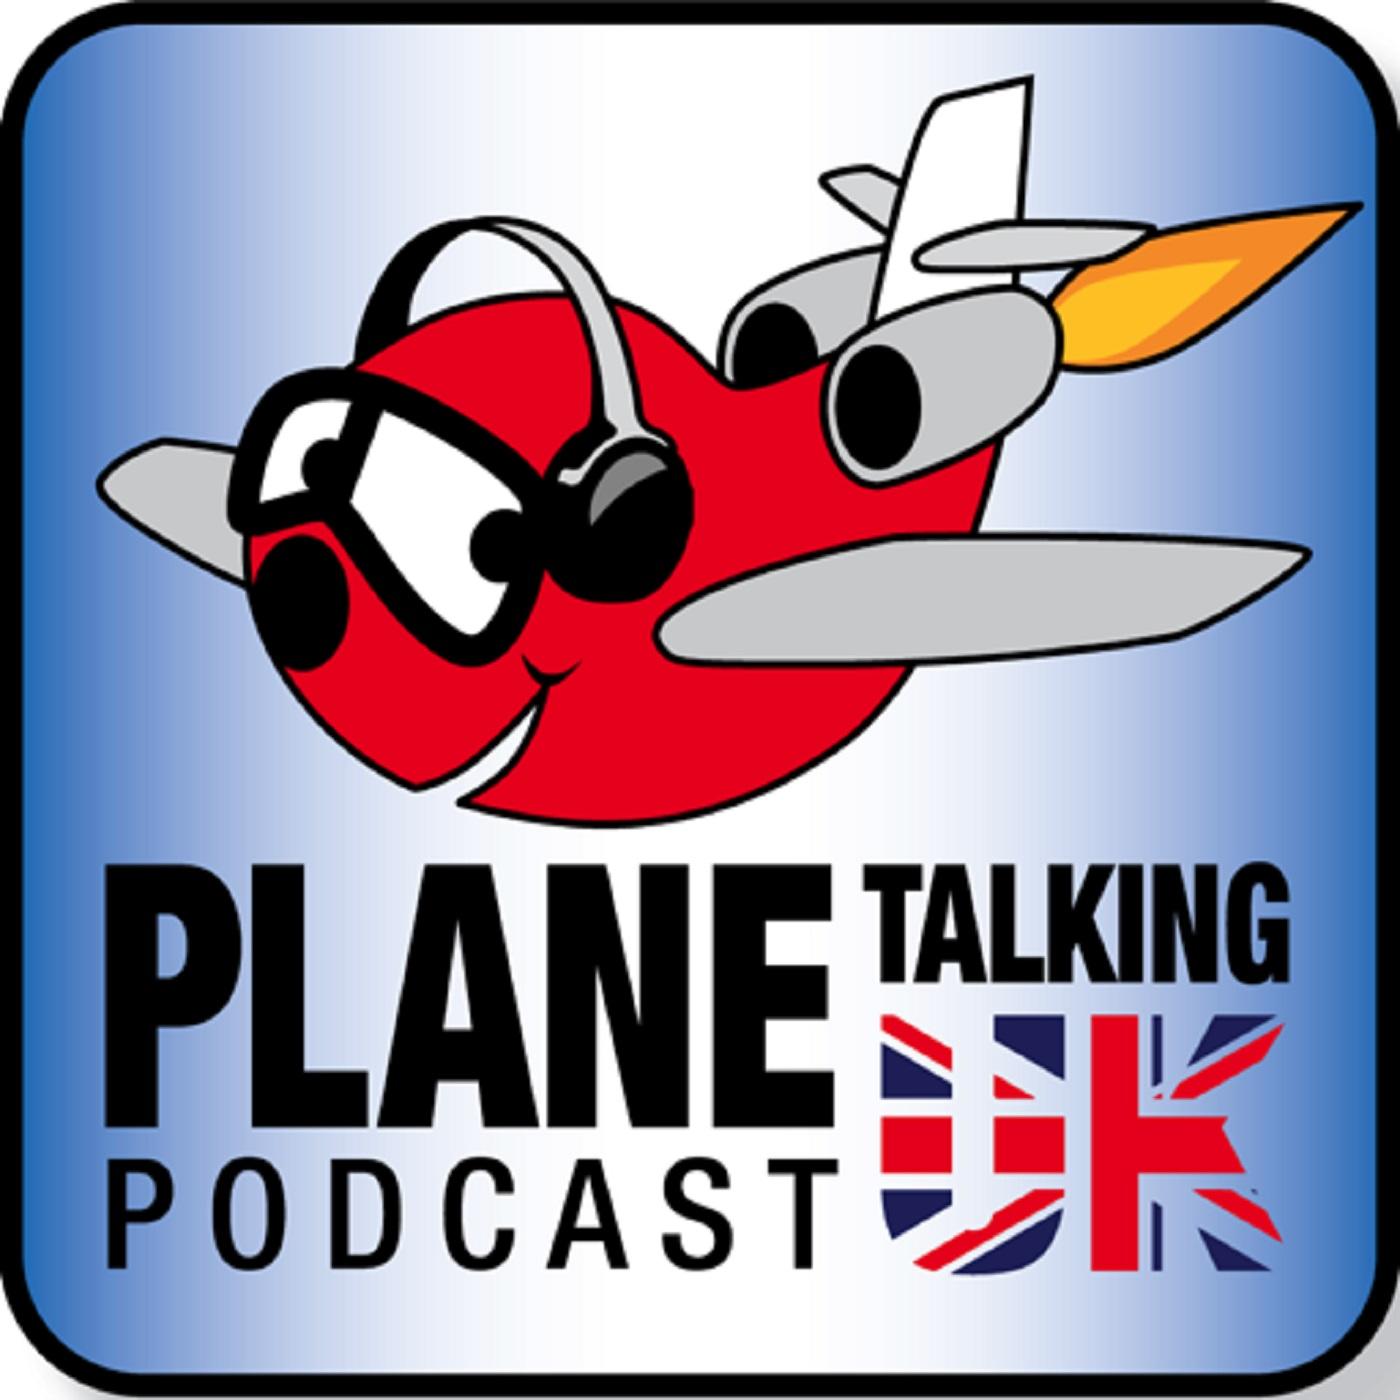 Plane Talking UK's Podcast show art